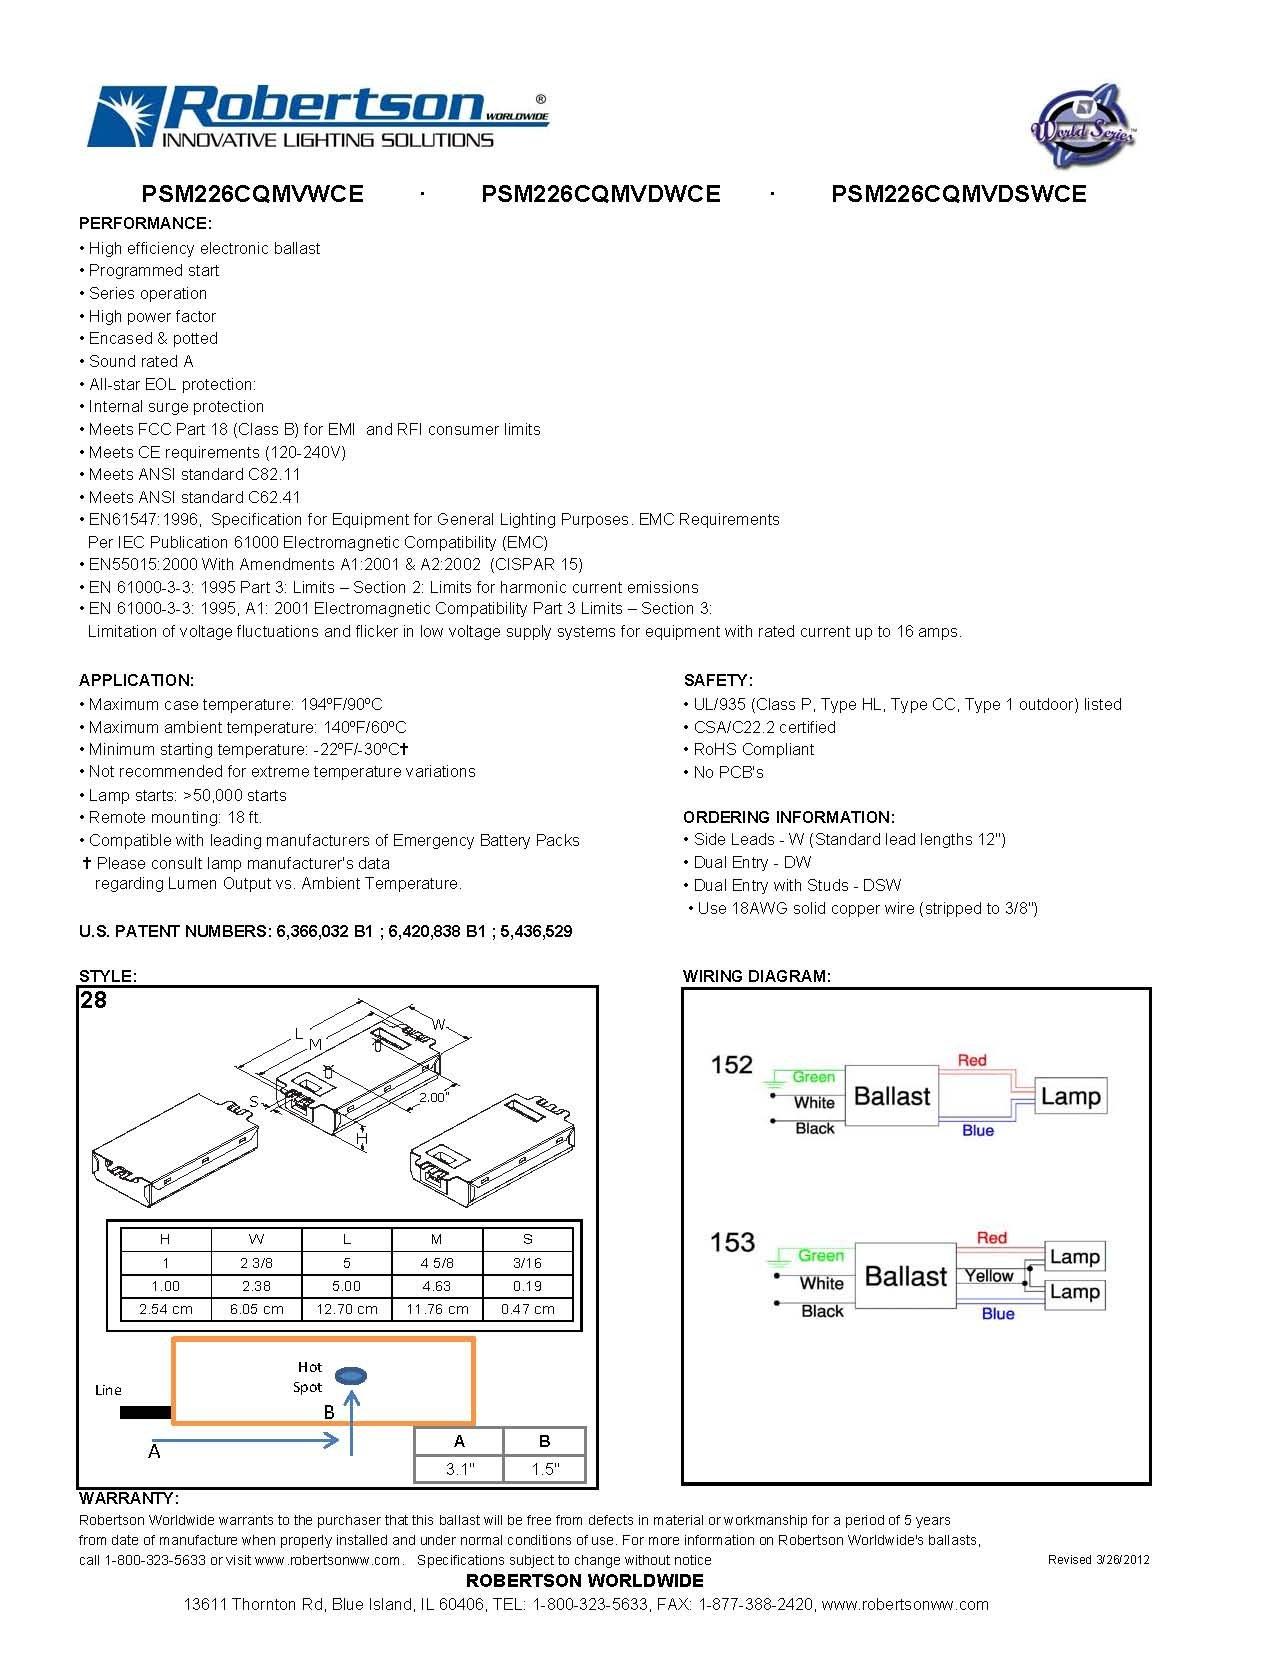 ROBERTSON 3P20157 PSM226CQMVWCE Fluorescent eBallast for 2 CFQ26W/G24q CFL Lamps, Program Start, 120-277Vac, 50-60Hz, Normal Ballast Factor, HPF